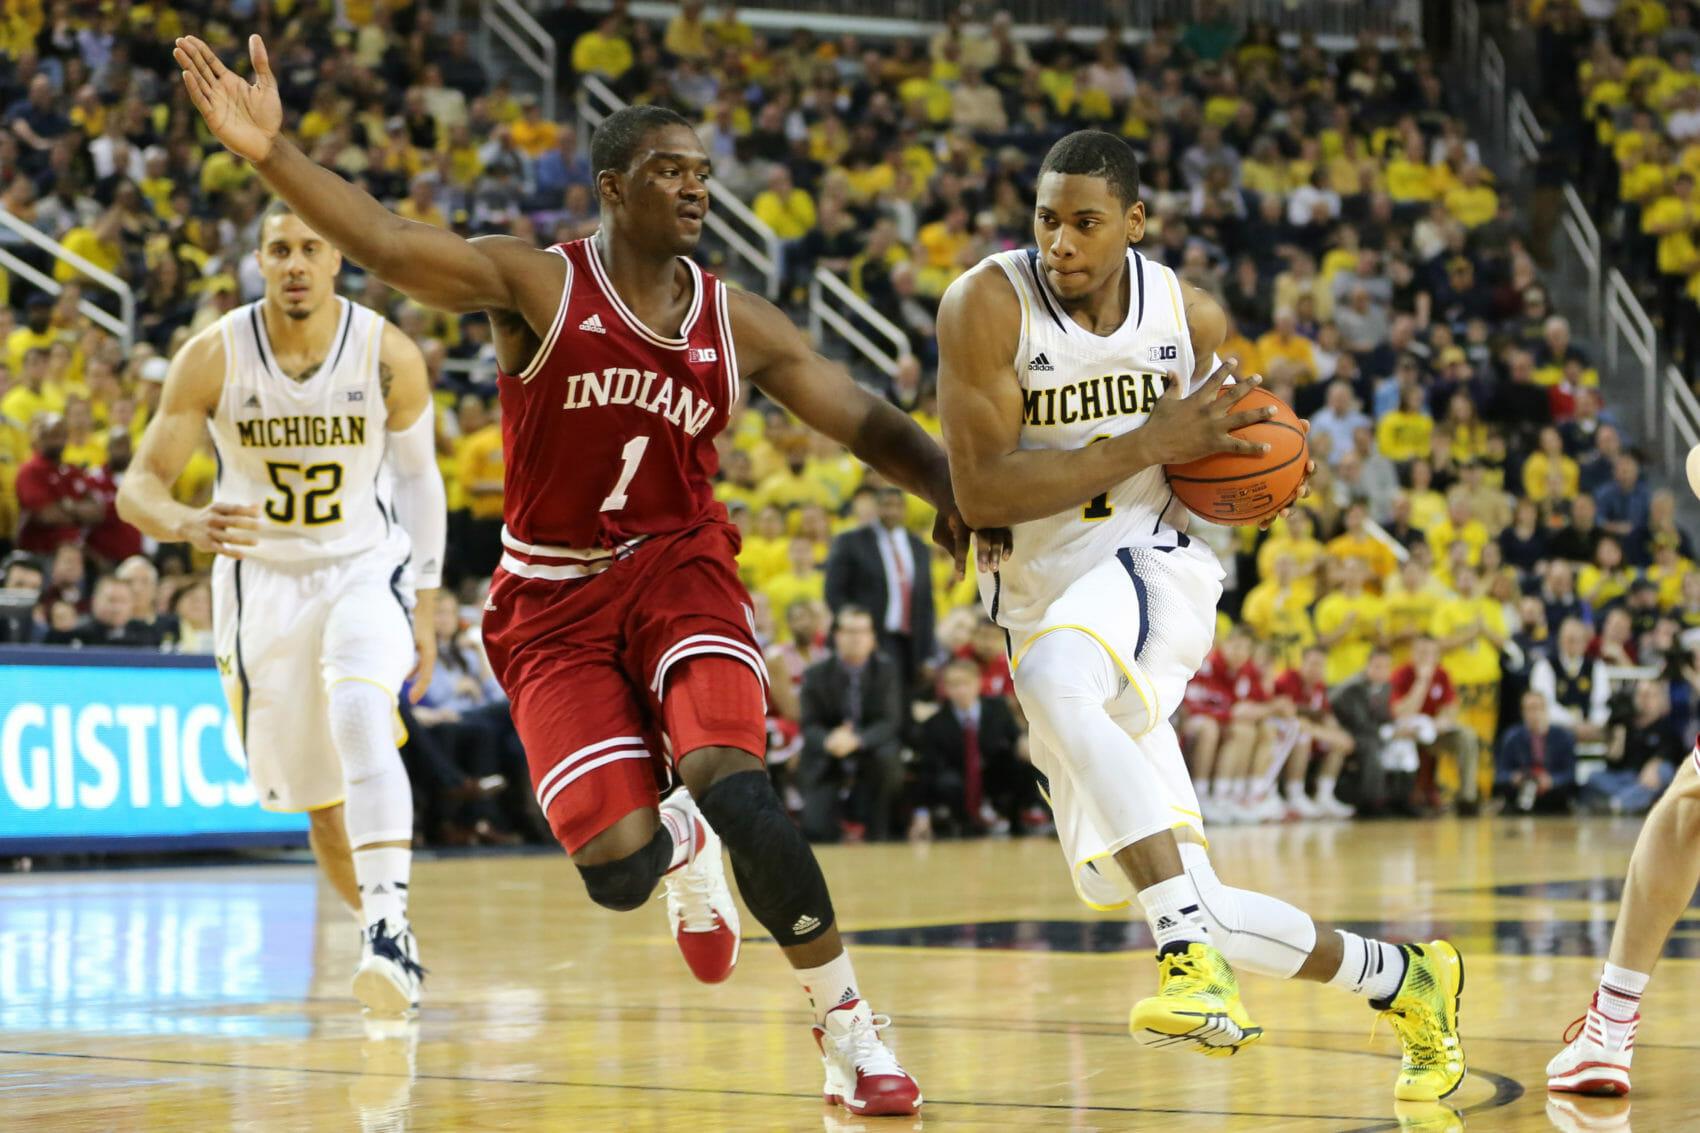 Michigan 84, Indiana 80-18